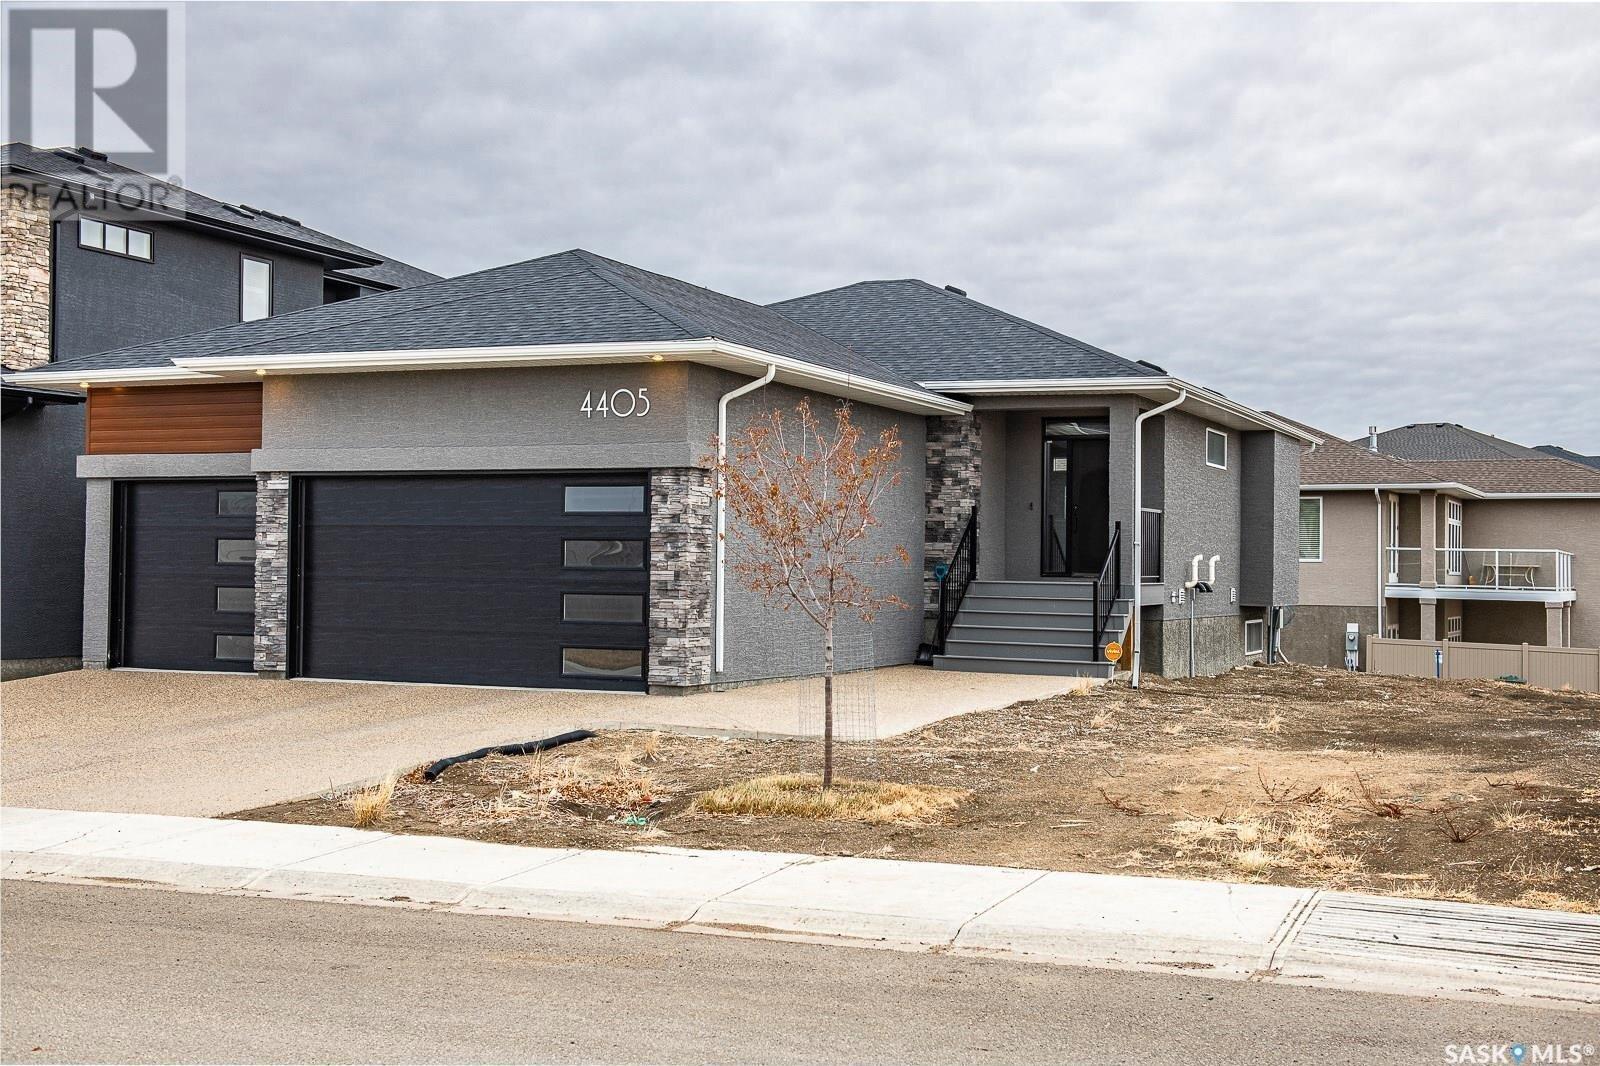 House for sale at 4405 Chuka Dr Regina Saskatchewan - MLS: SK833596